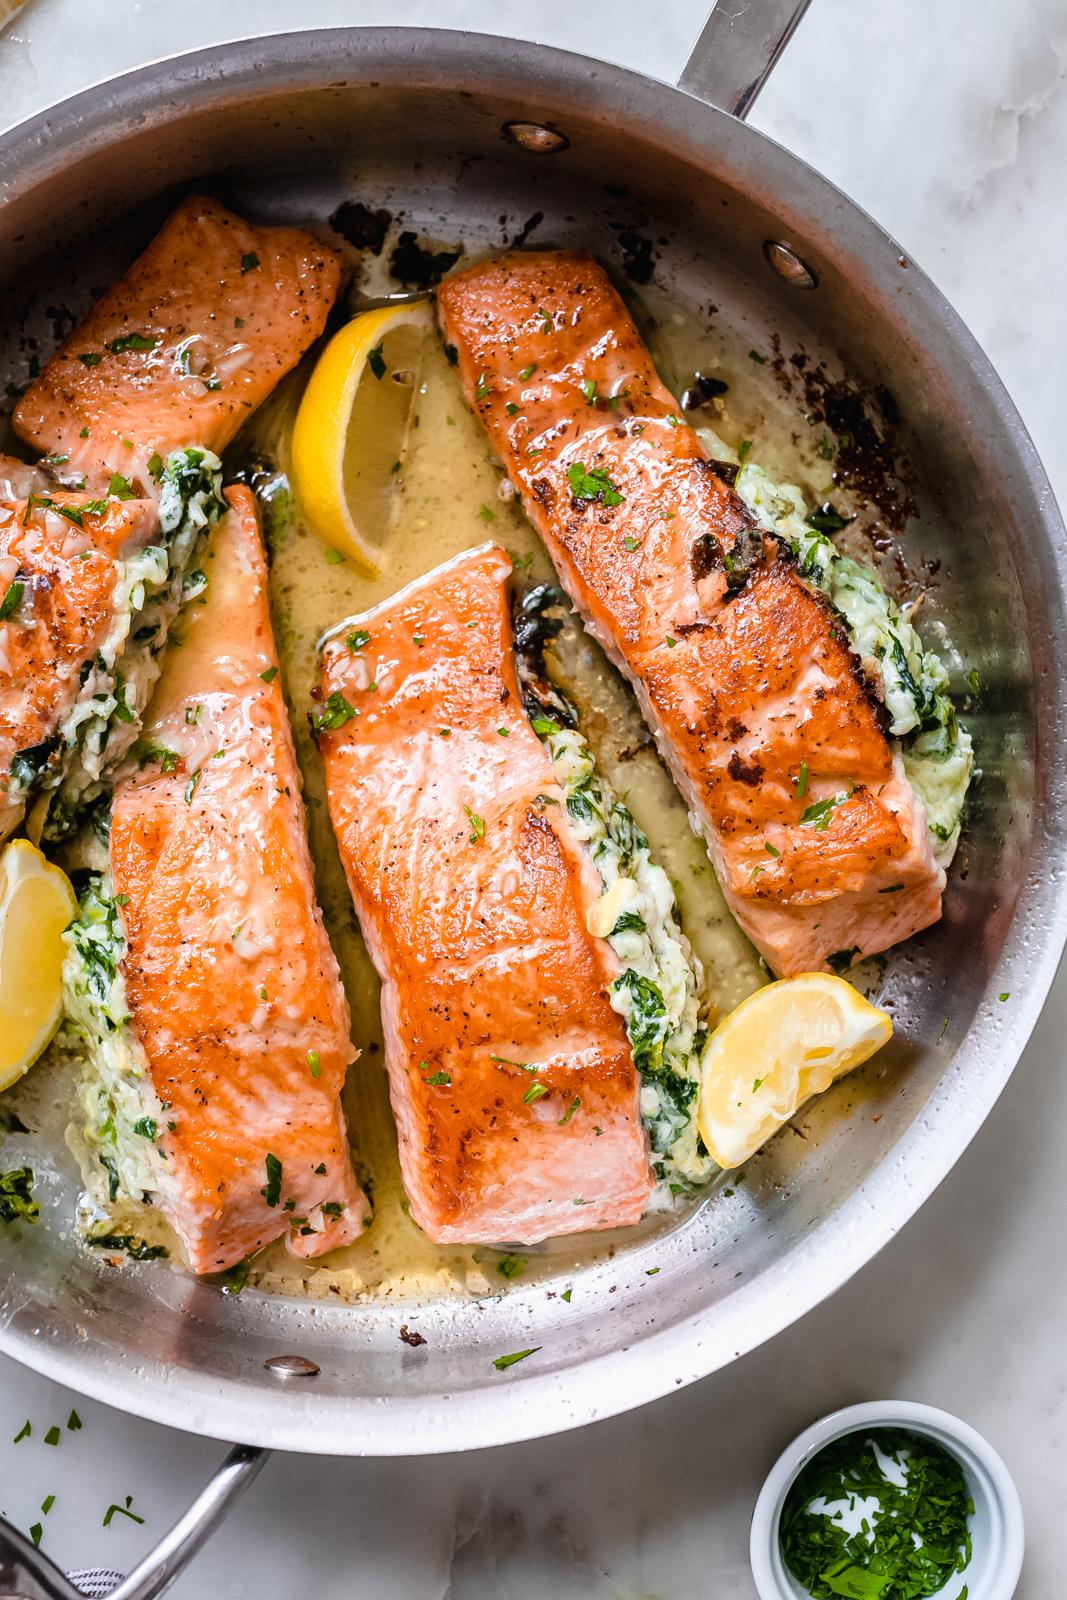 lemon butter sauce drizzled on artichoke and spinach stuffed salmon filets